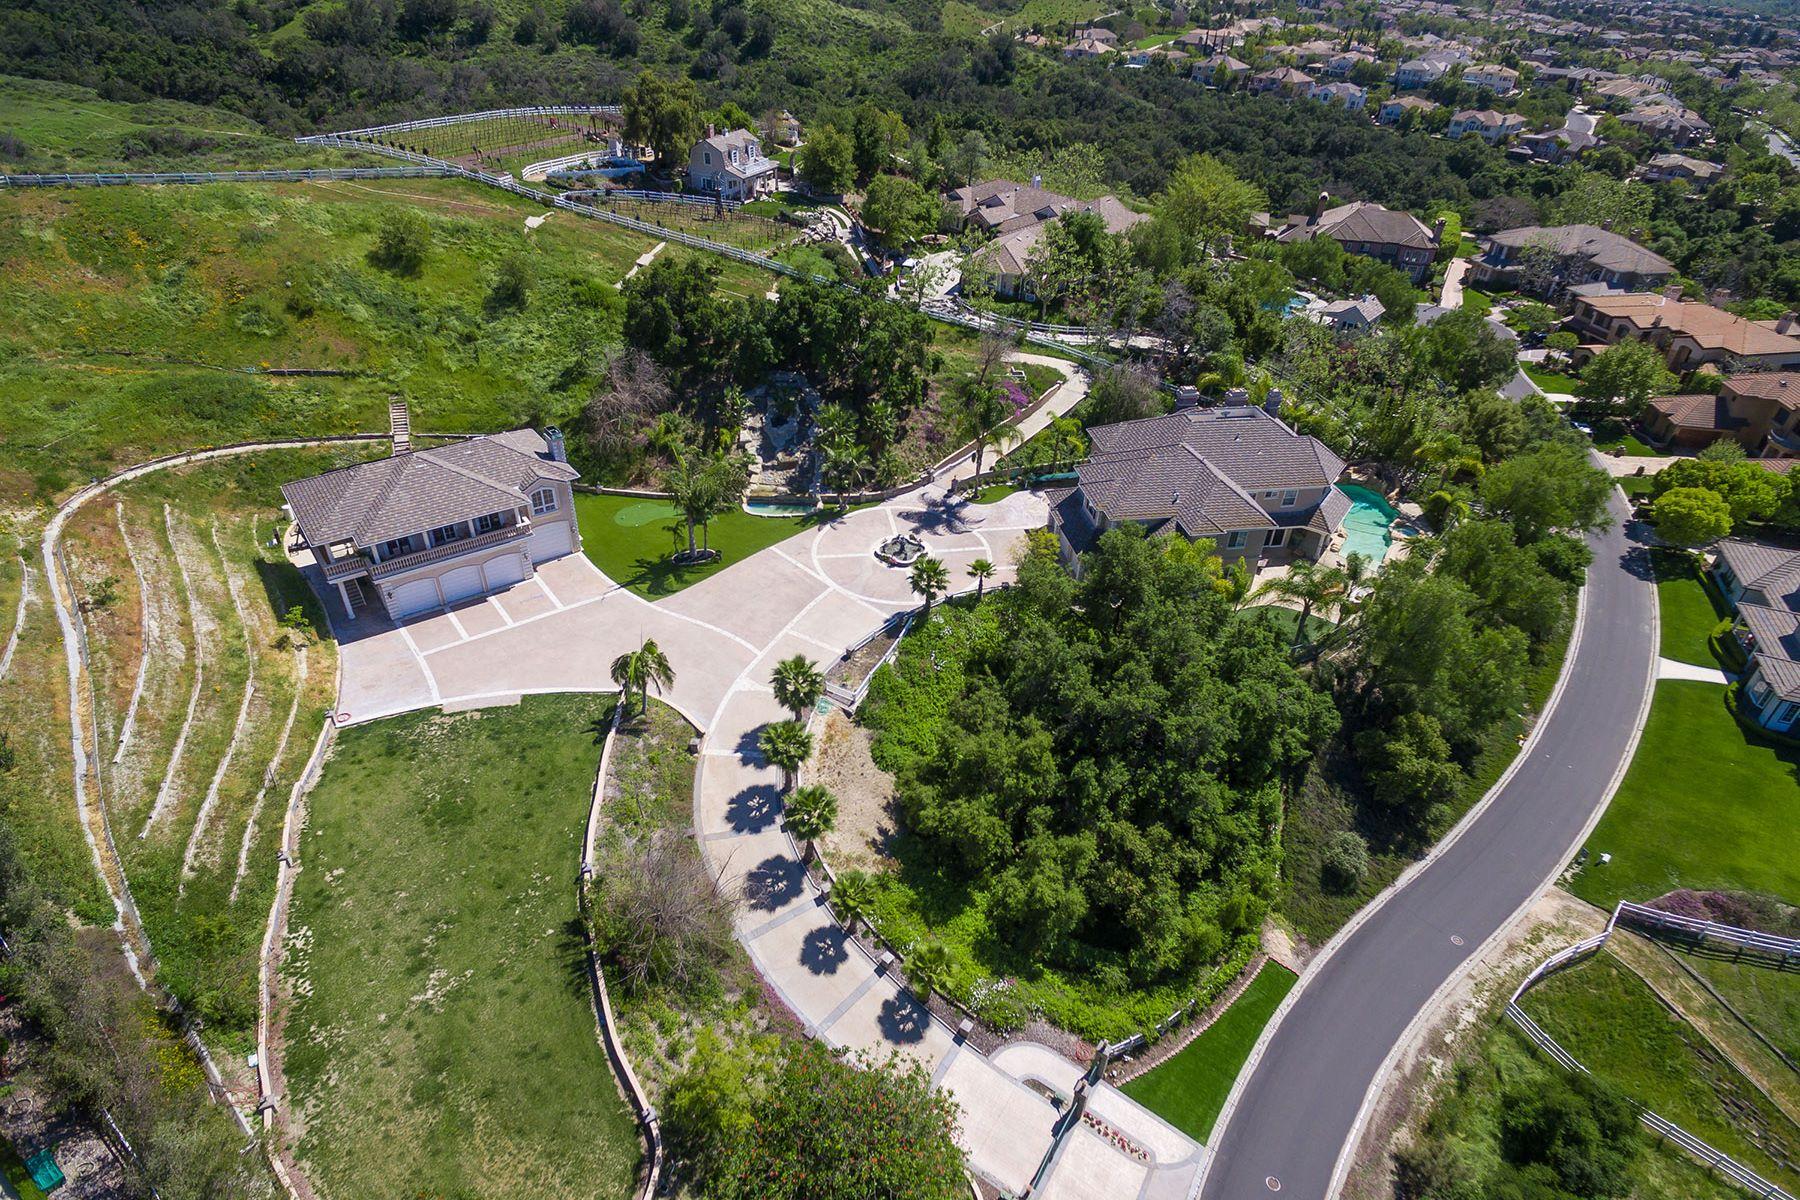 Single Family Home for Sale at 12 Oak Canyon Trail Coto De Caza, California 92679 United States